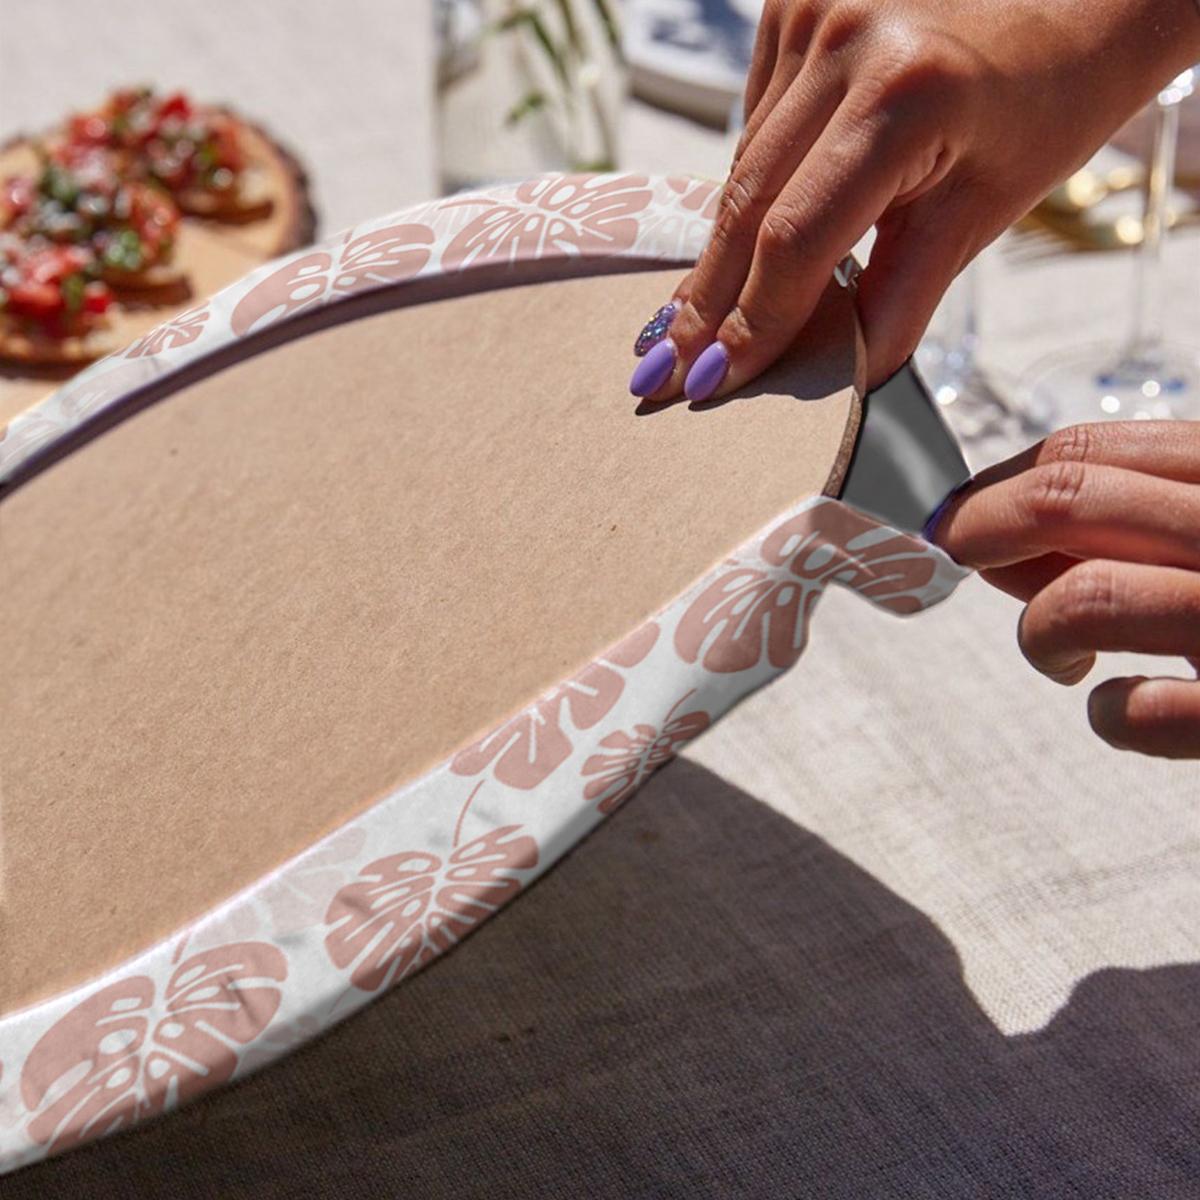 6'lı Soft Renkli Yaprak Tasarımlı Servis Altlığı & Supla Realhomes